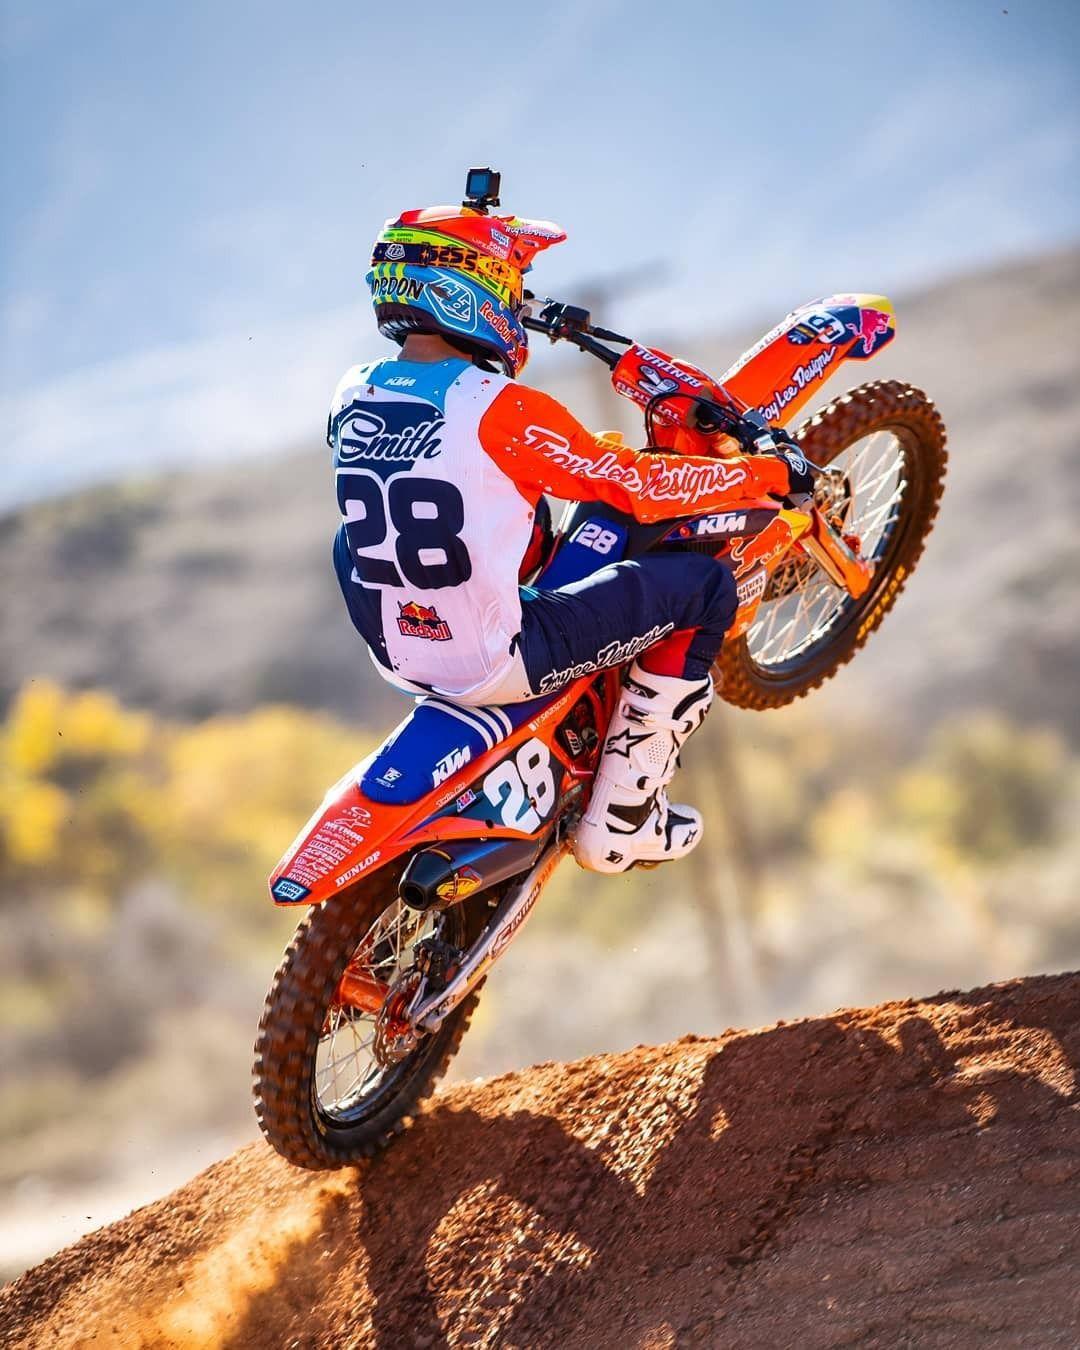 Iphone Ktm Dirt Bike Wallpaper Get wallpaper motocross ktm pictures